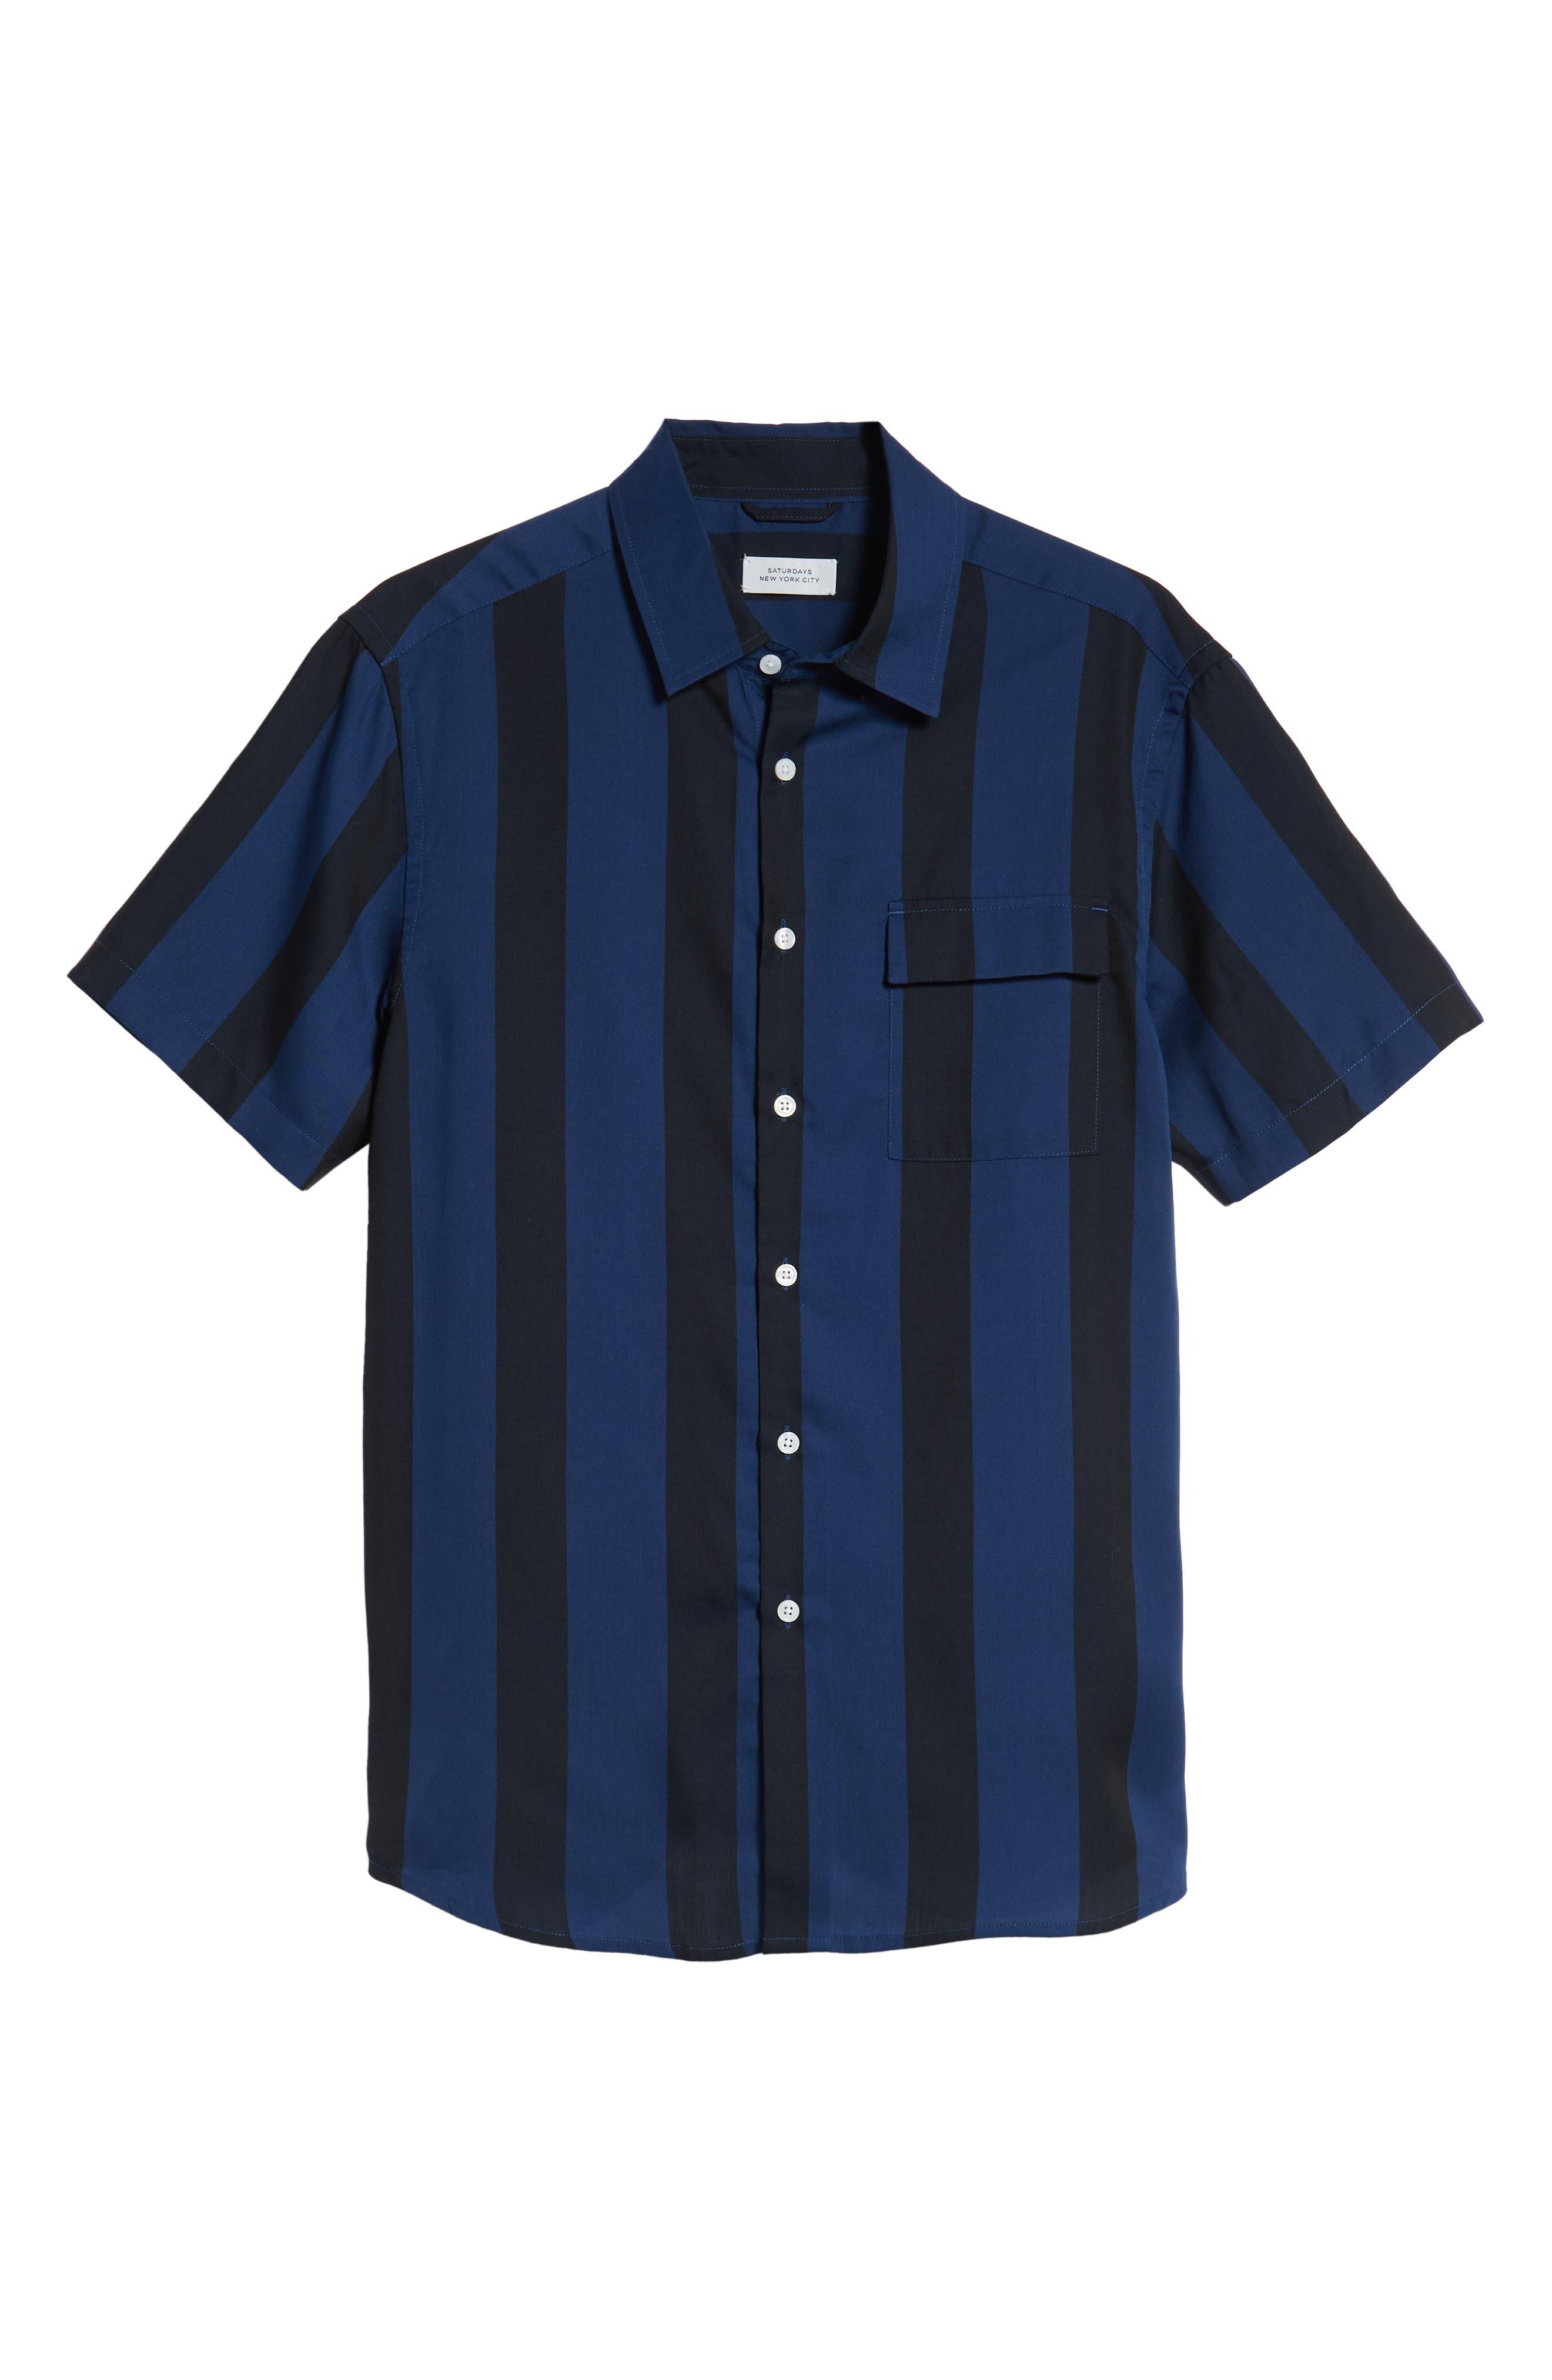 SATURDAYS NYC,                             Saturdays Nico Broad Stripe Woven Shirt,                             Alternate thumbnail 5, color,                             001